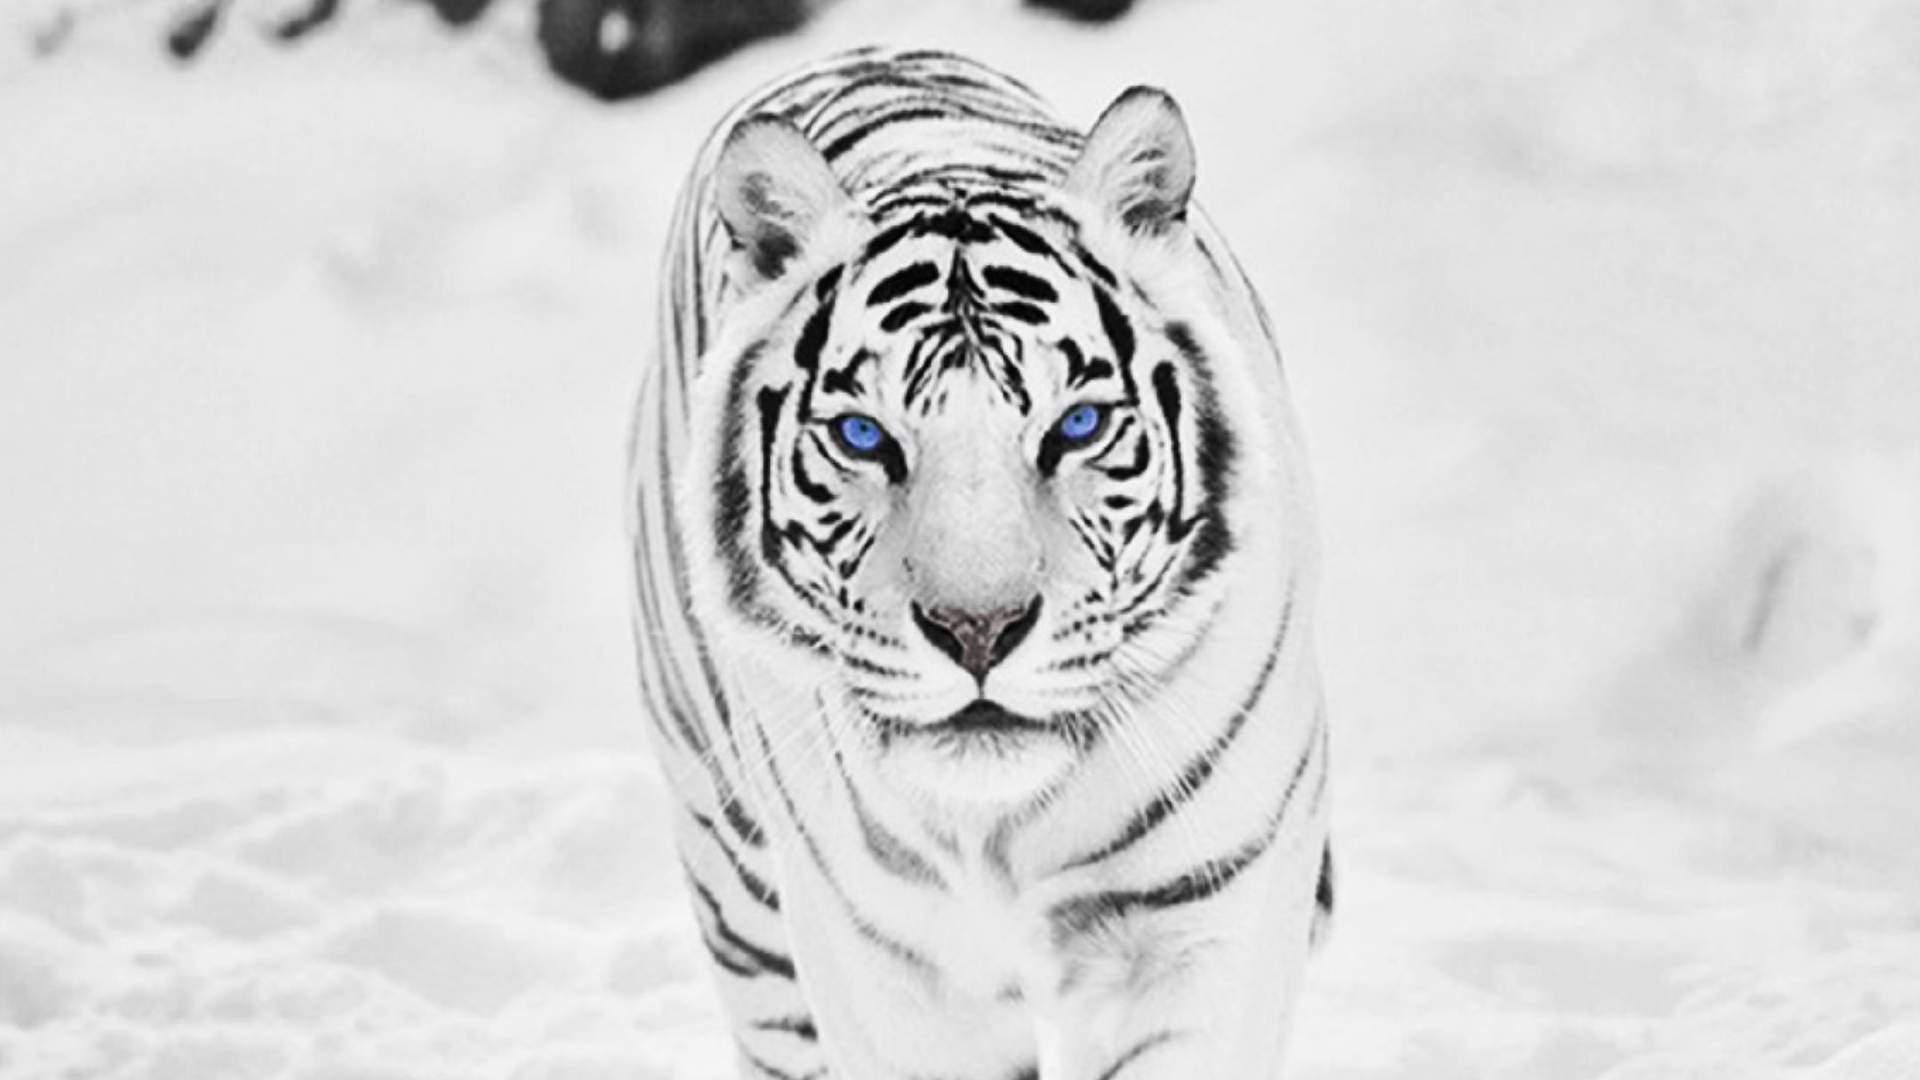 White Tiger Wallpaper Background Snow Tiger Tiger Wallpaper White Tiger